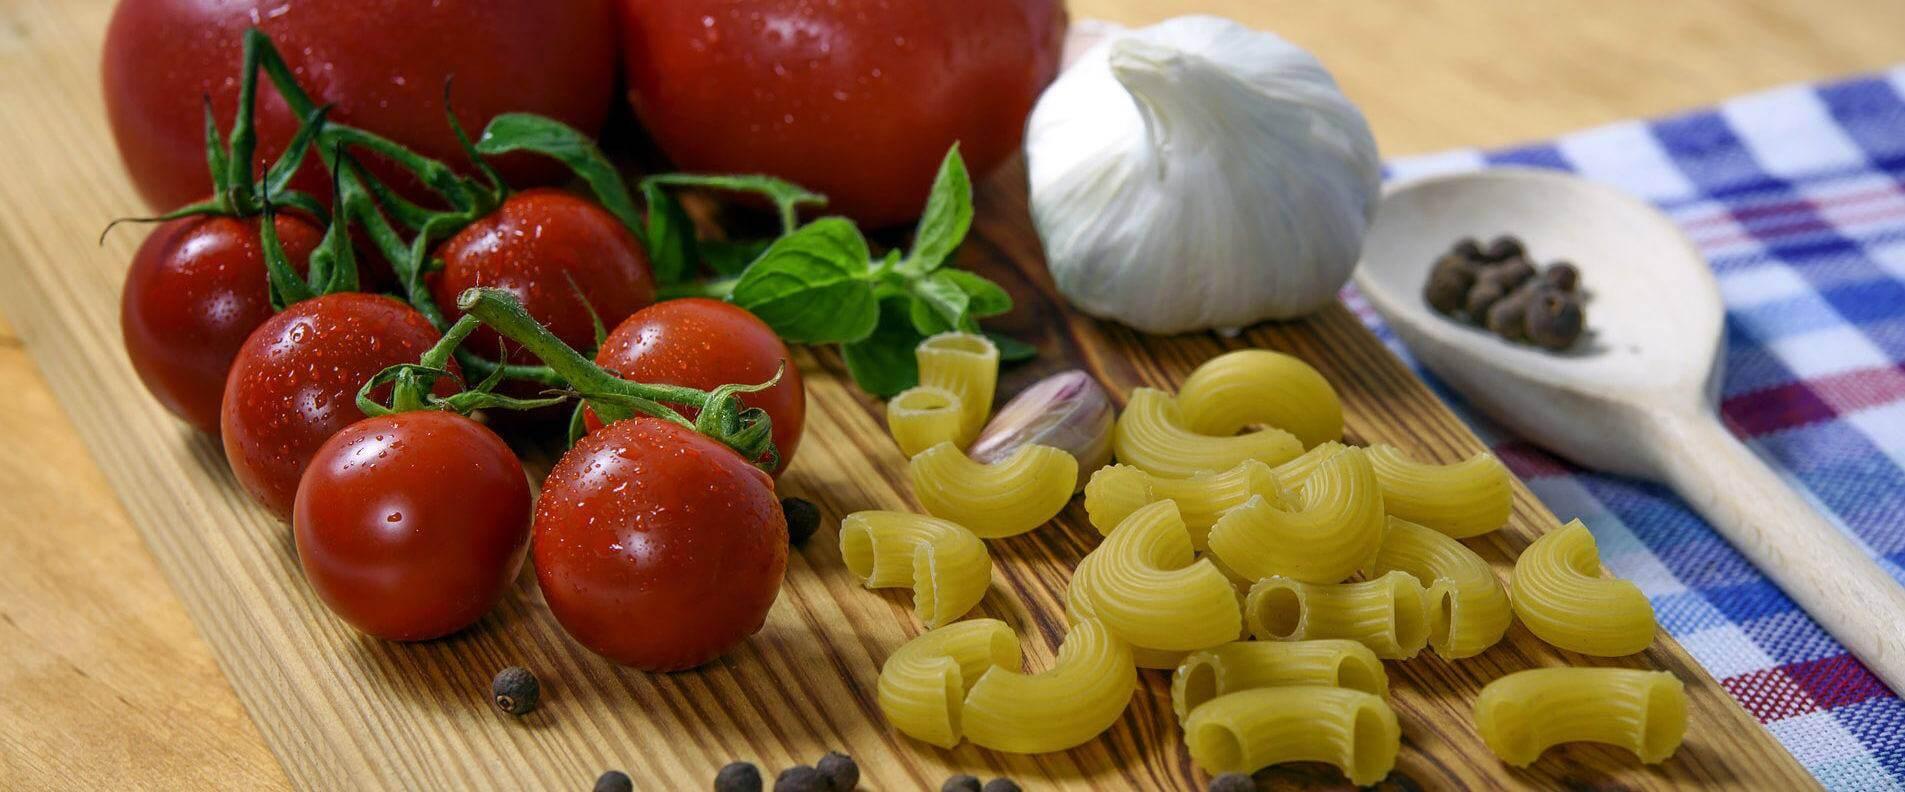 dieta mediterranea nutrizione sana